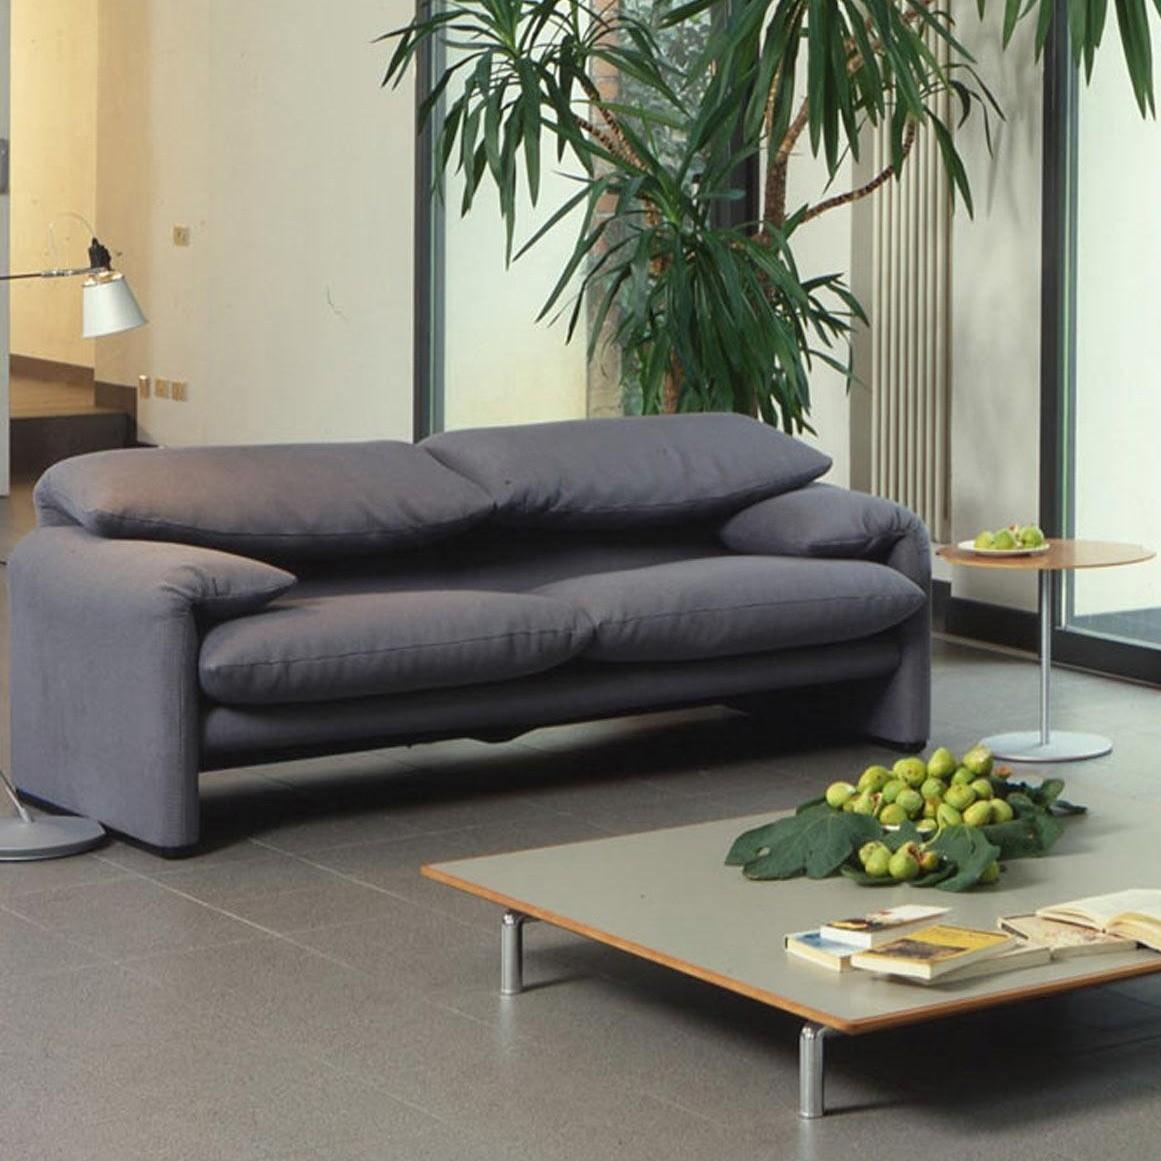 cassina maralunga 40 2 seater sofa 190x86cm ambientedirect